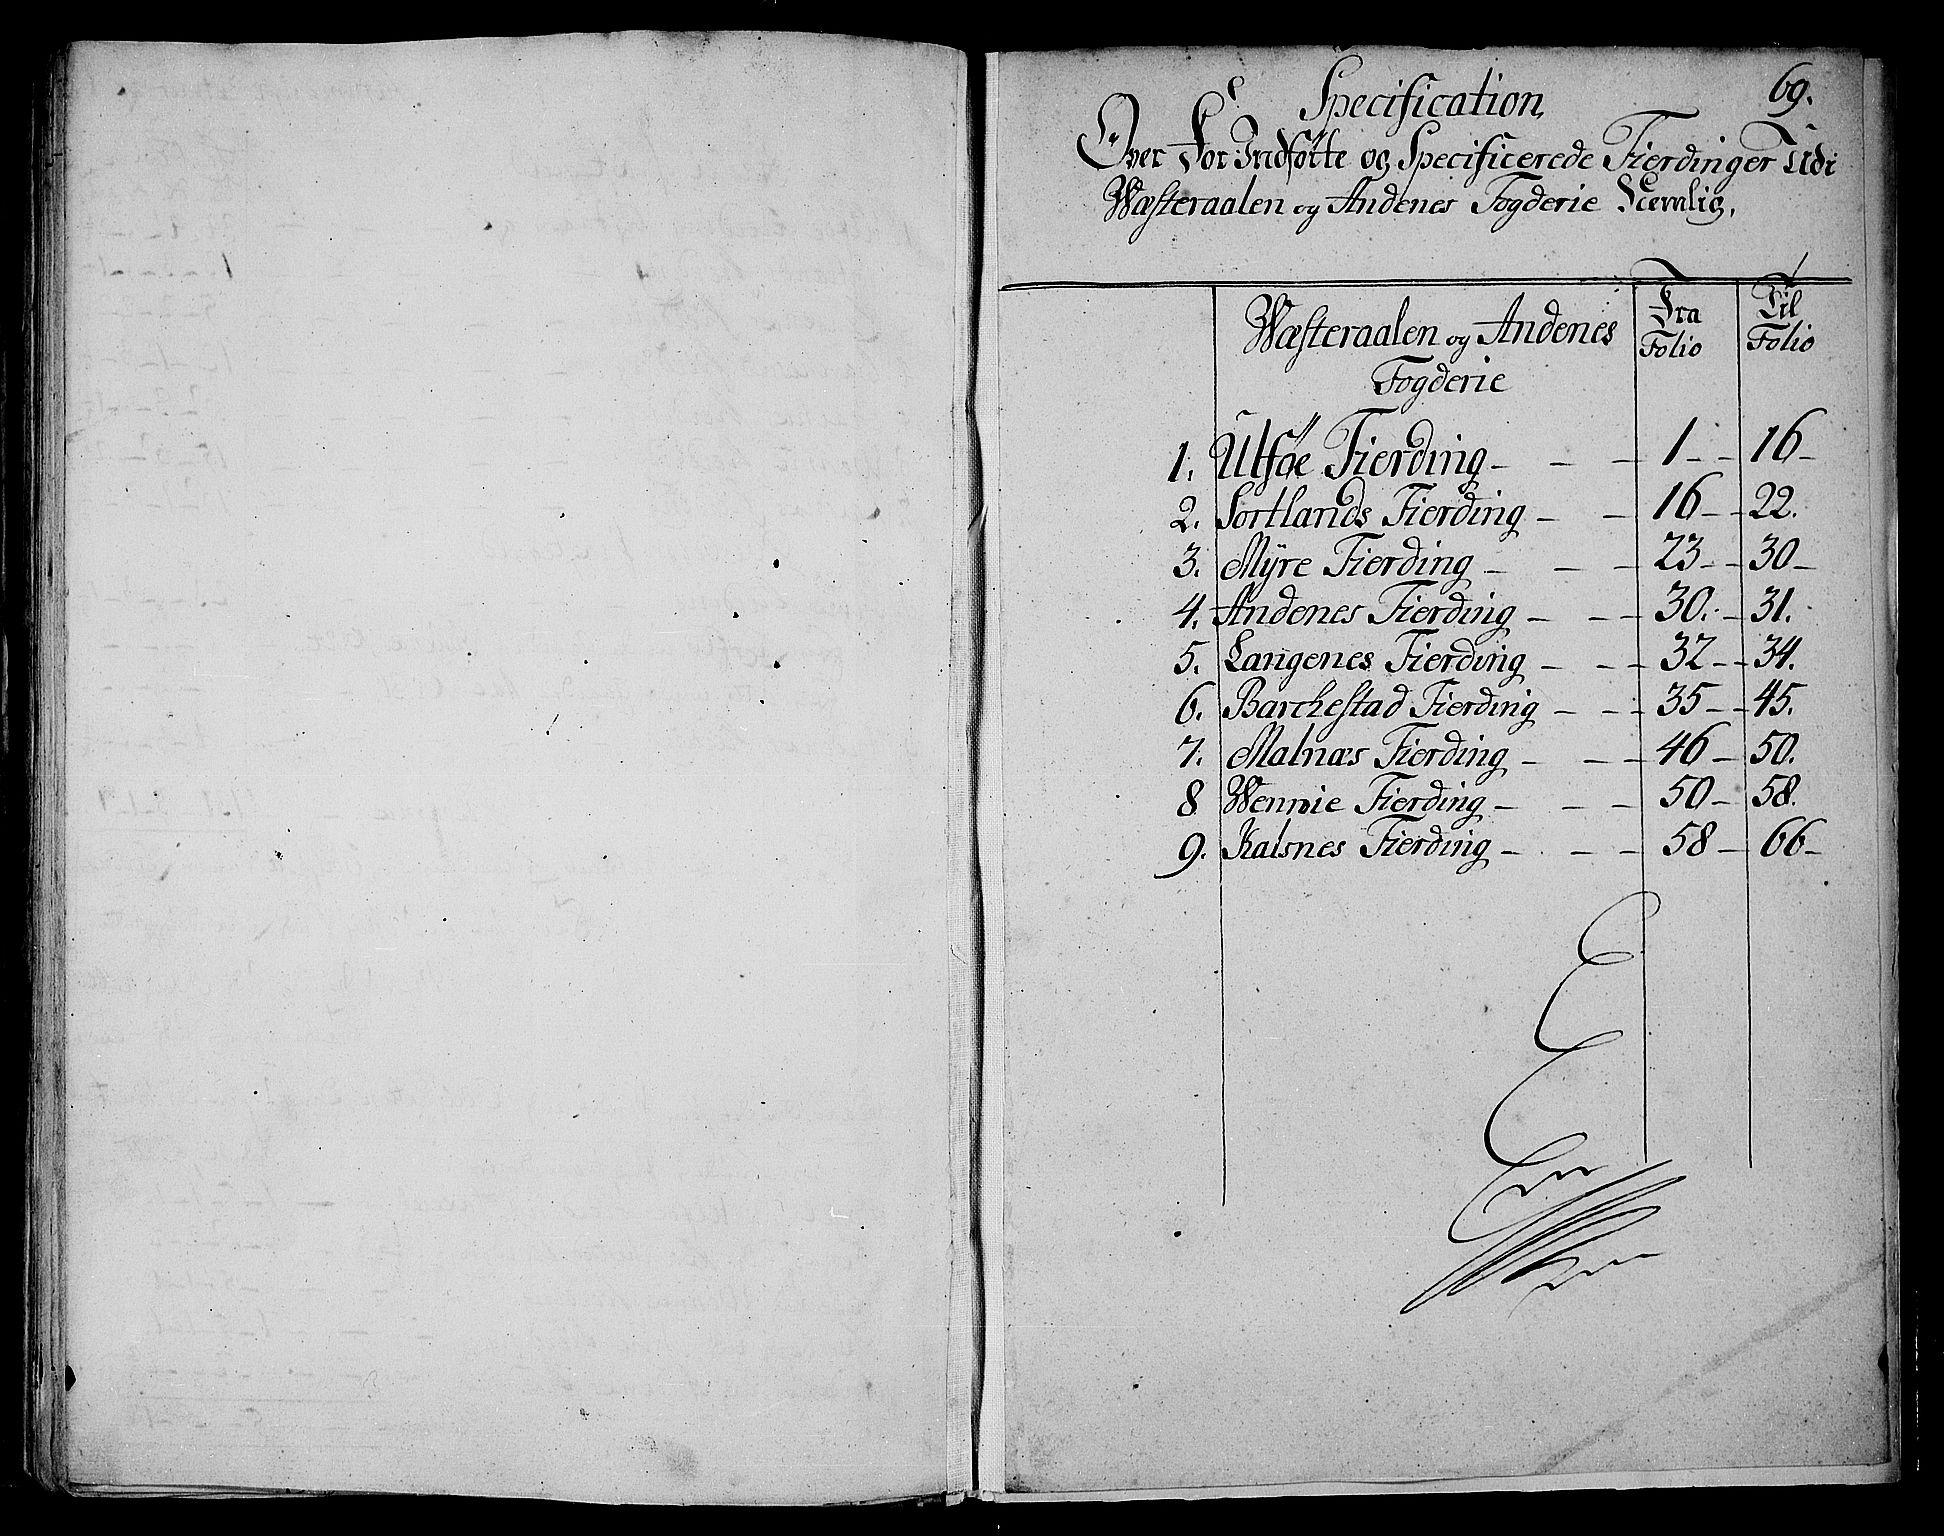 RA, Rentekammeret inntil 1814, Realistisk ordnet avdeling, N/Nb/Nbf/L0177: Vesterålen og Andenes matrikkelprotokoll, 1723, s. 68b-69a